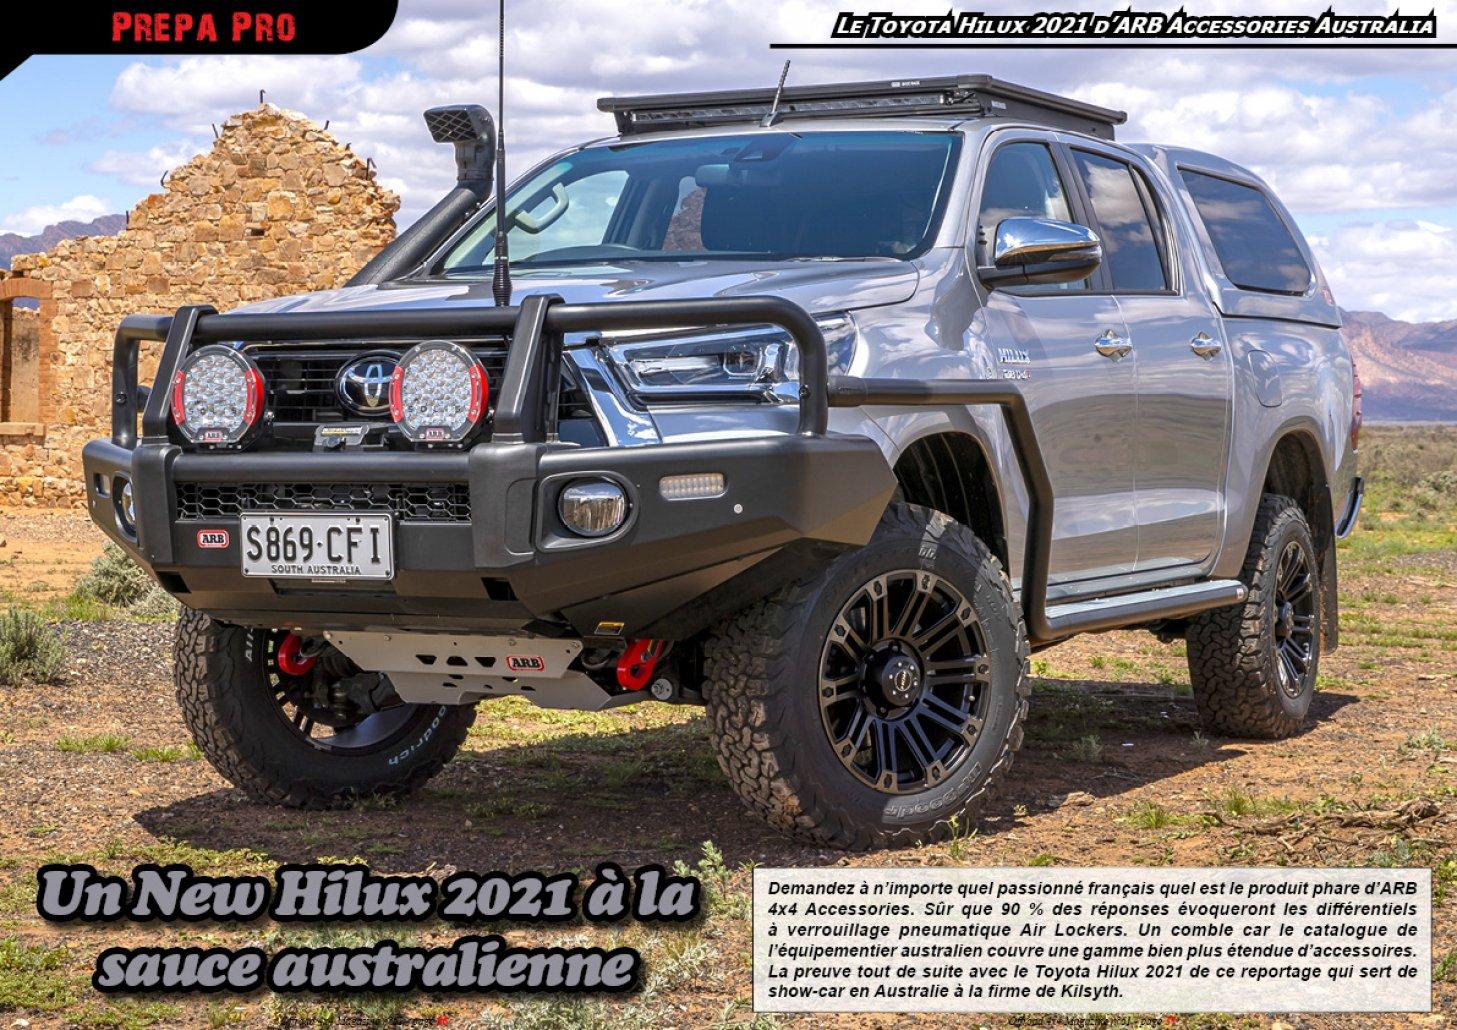 Le Toyota New Hilux d'ARB Accessories